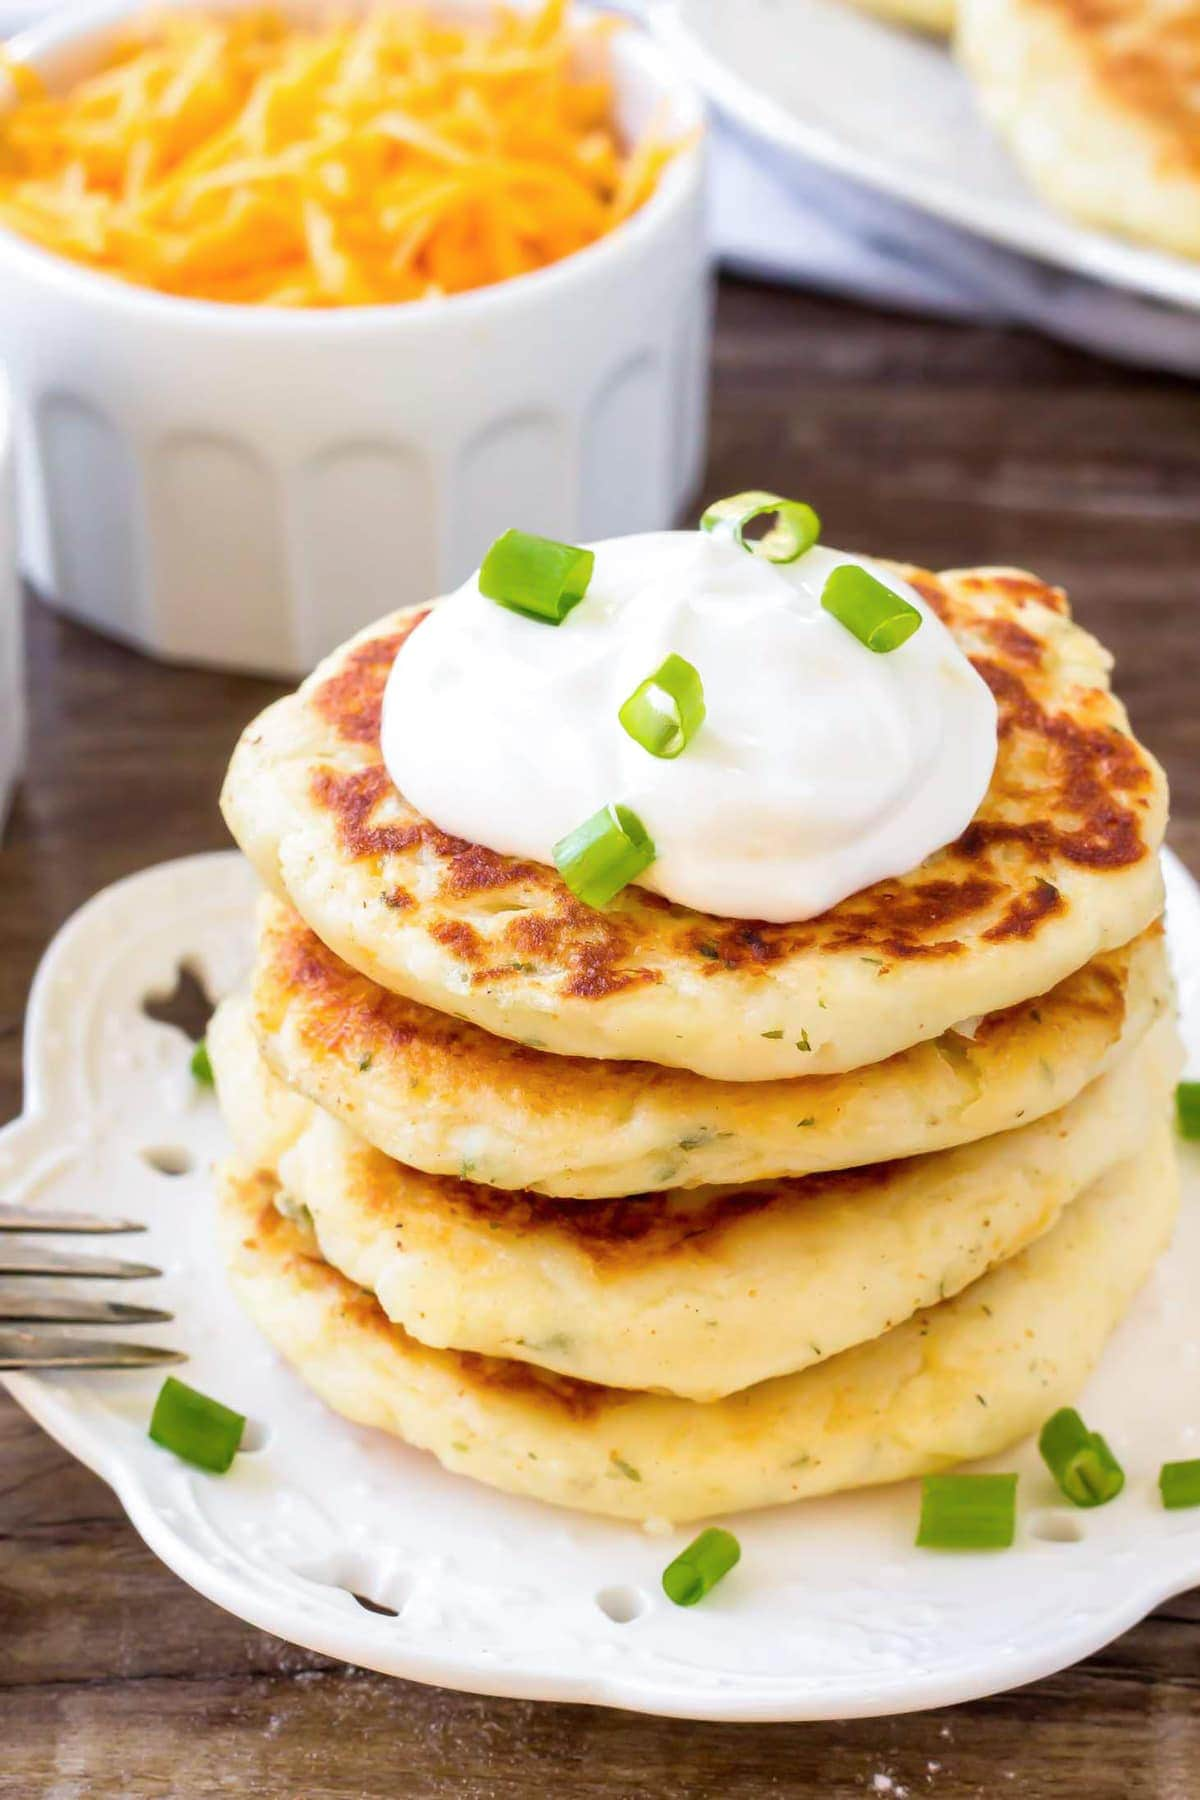 Potato Pancake Recipe stacked on plate.